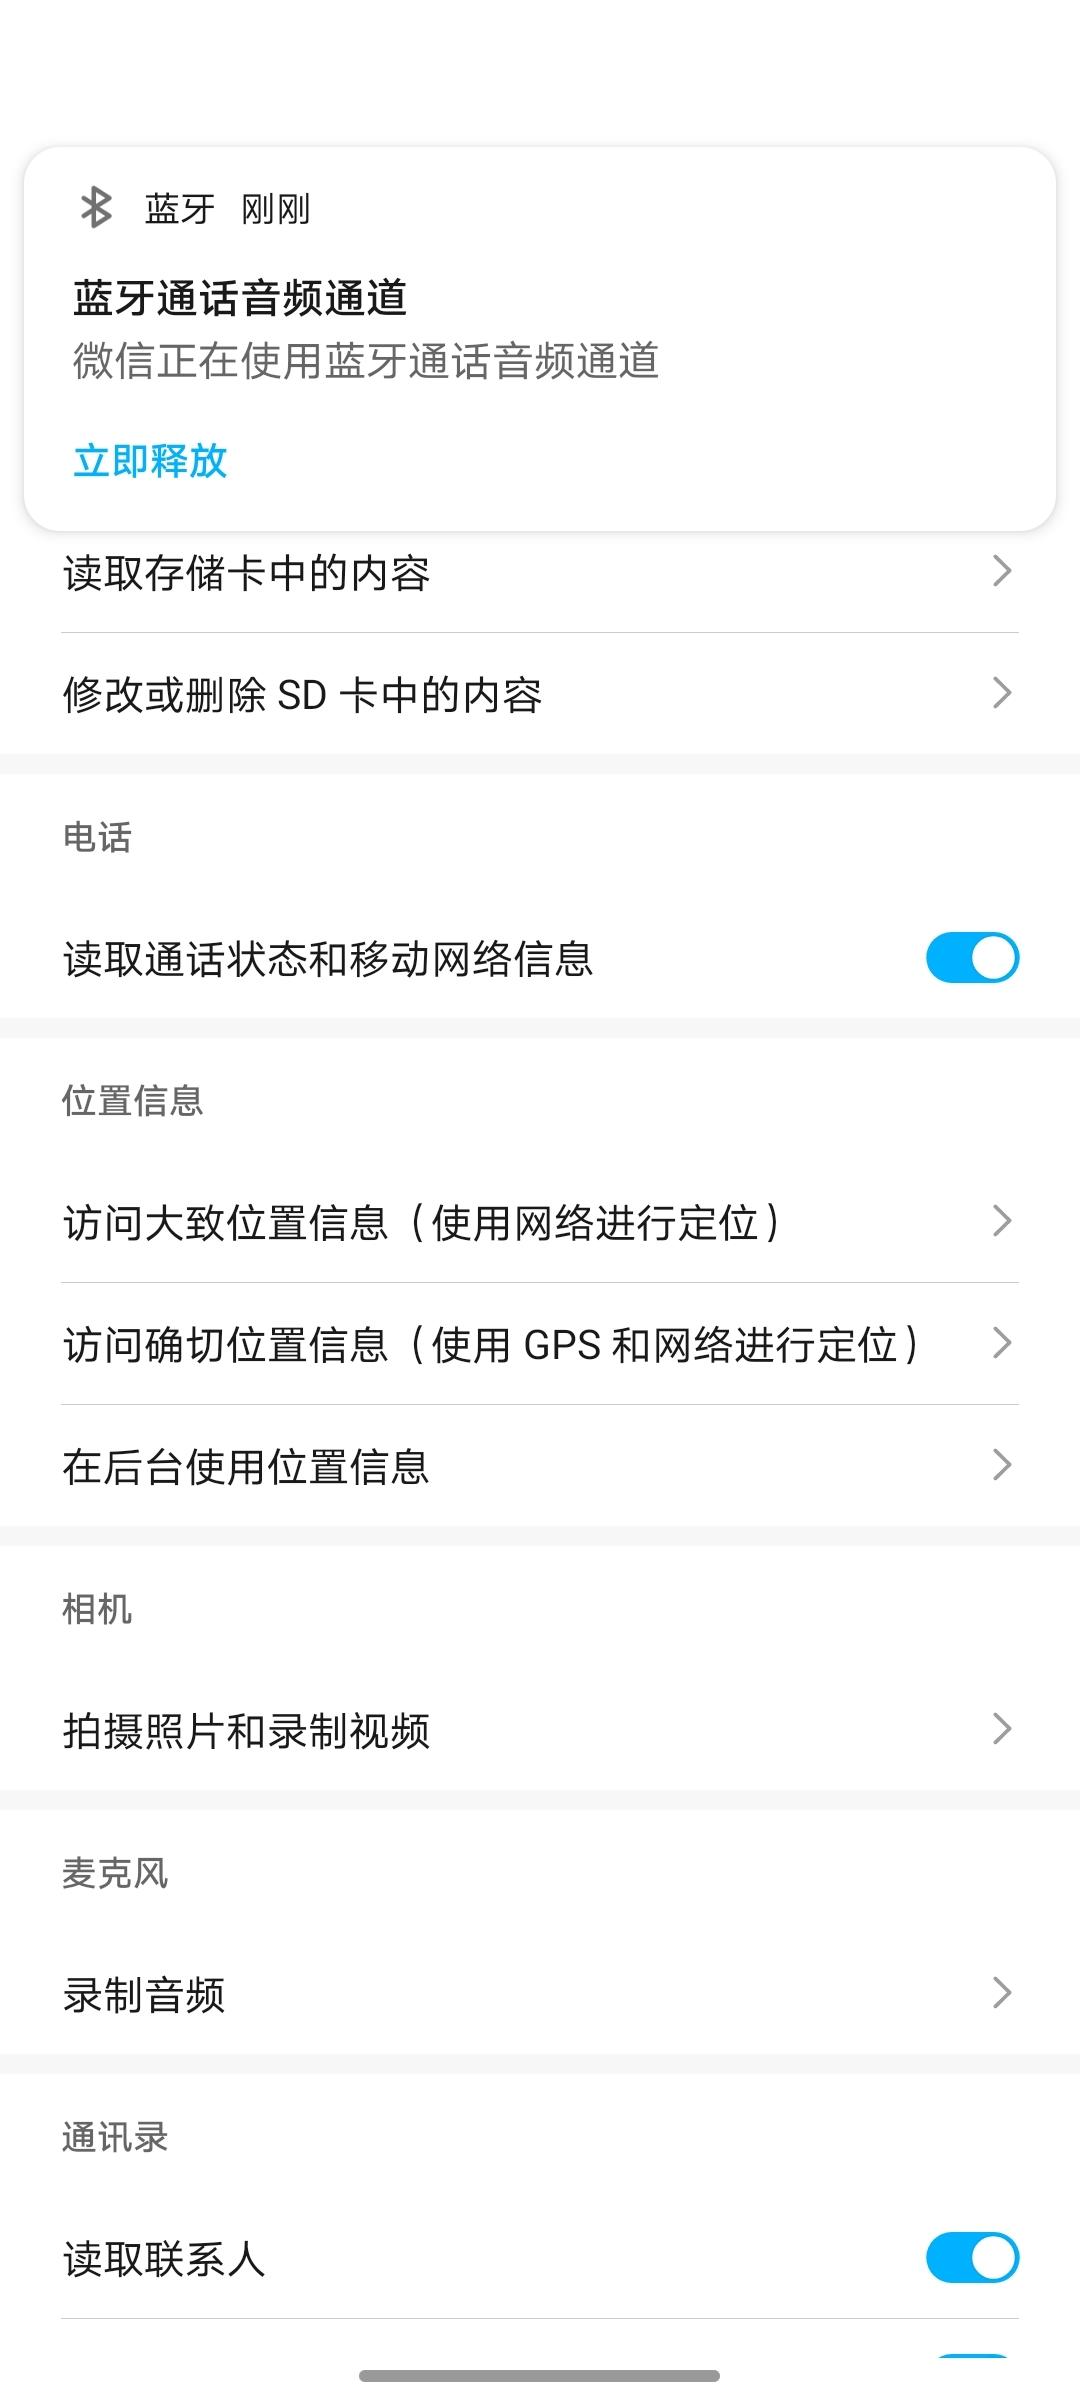 Screenshot_20200922_071901_com.android.permissioncontroller.jpg